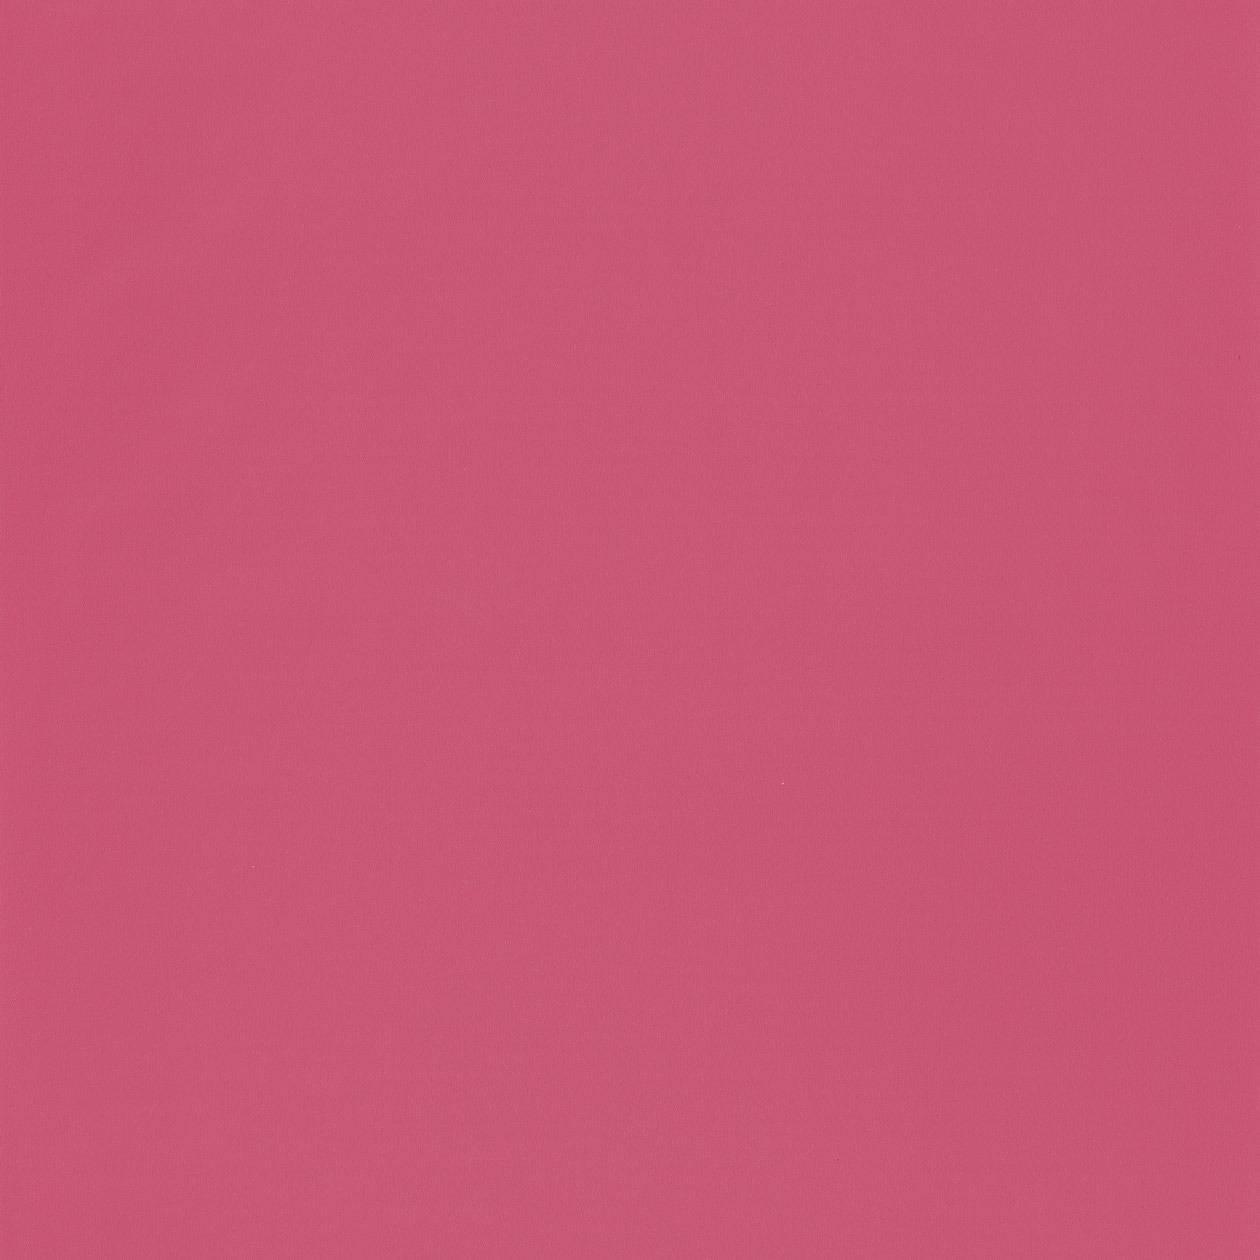 Caselio Uni Rose Fushia Wallpaper 100874218 1260x1260